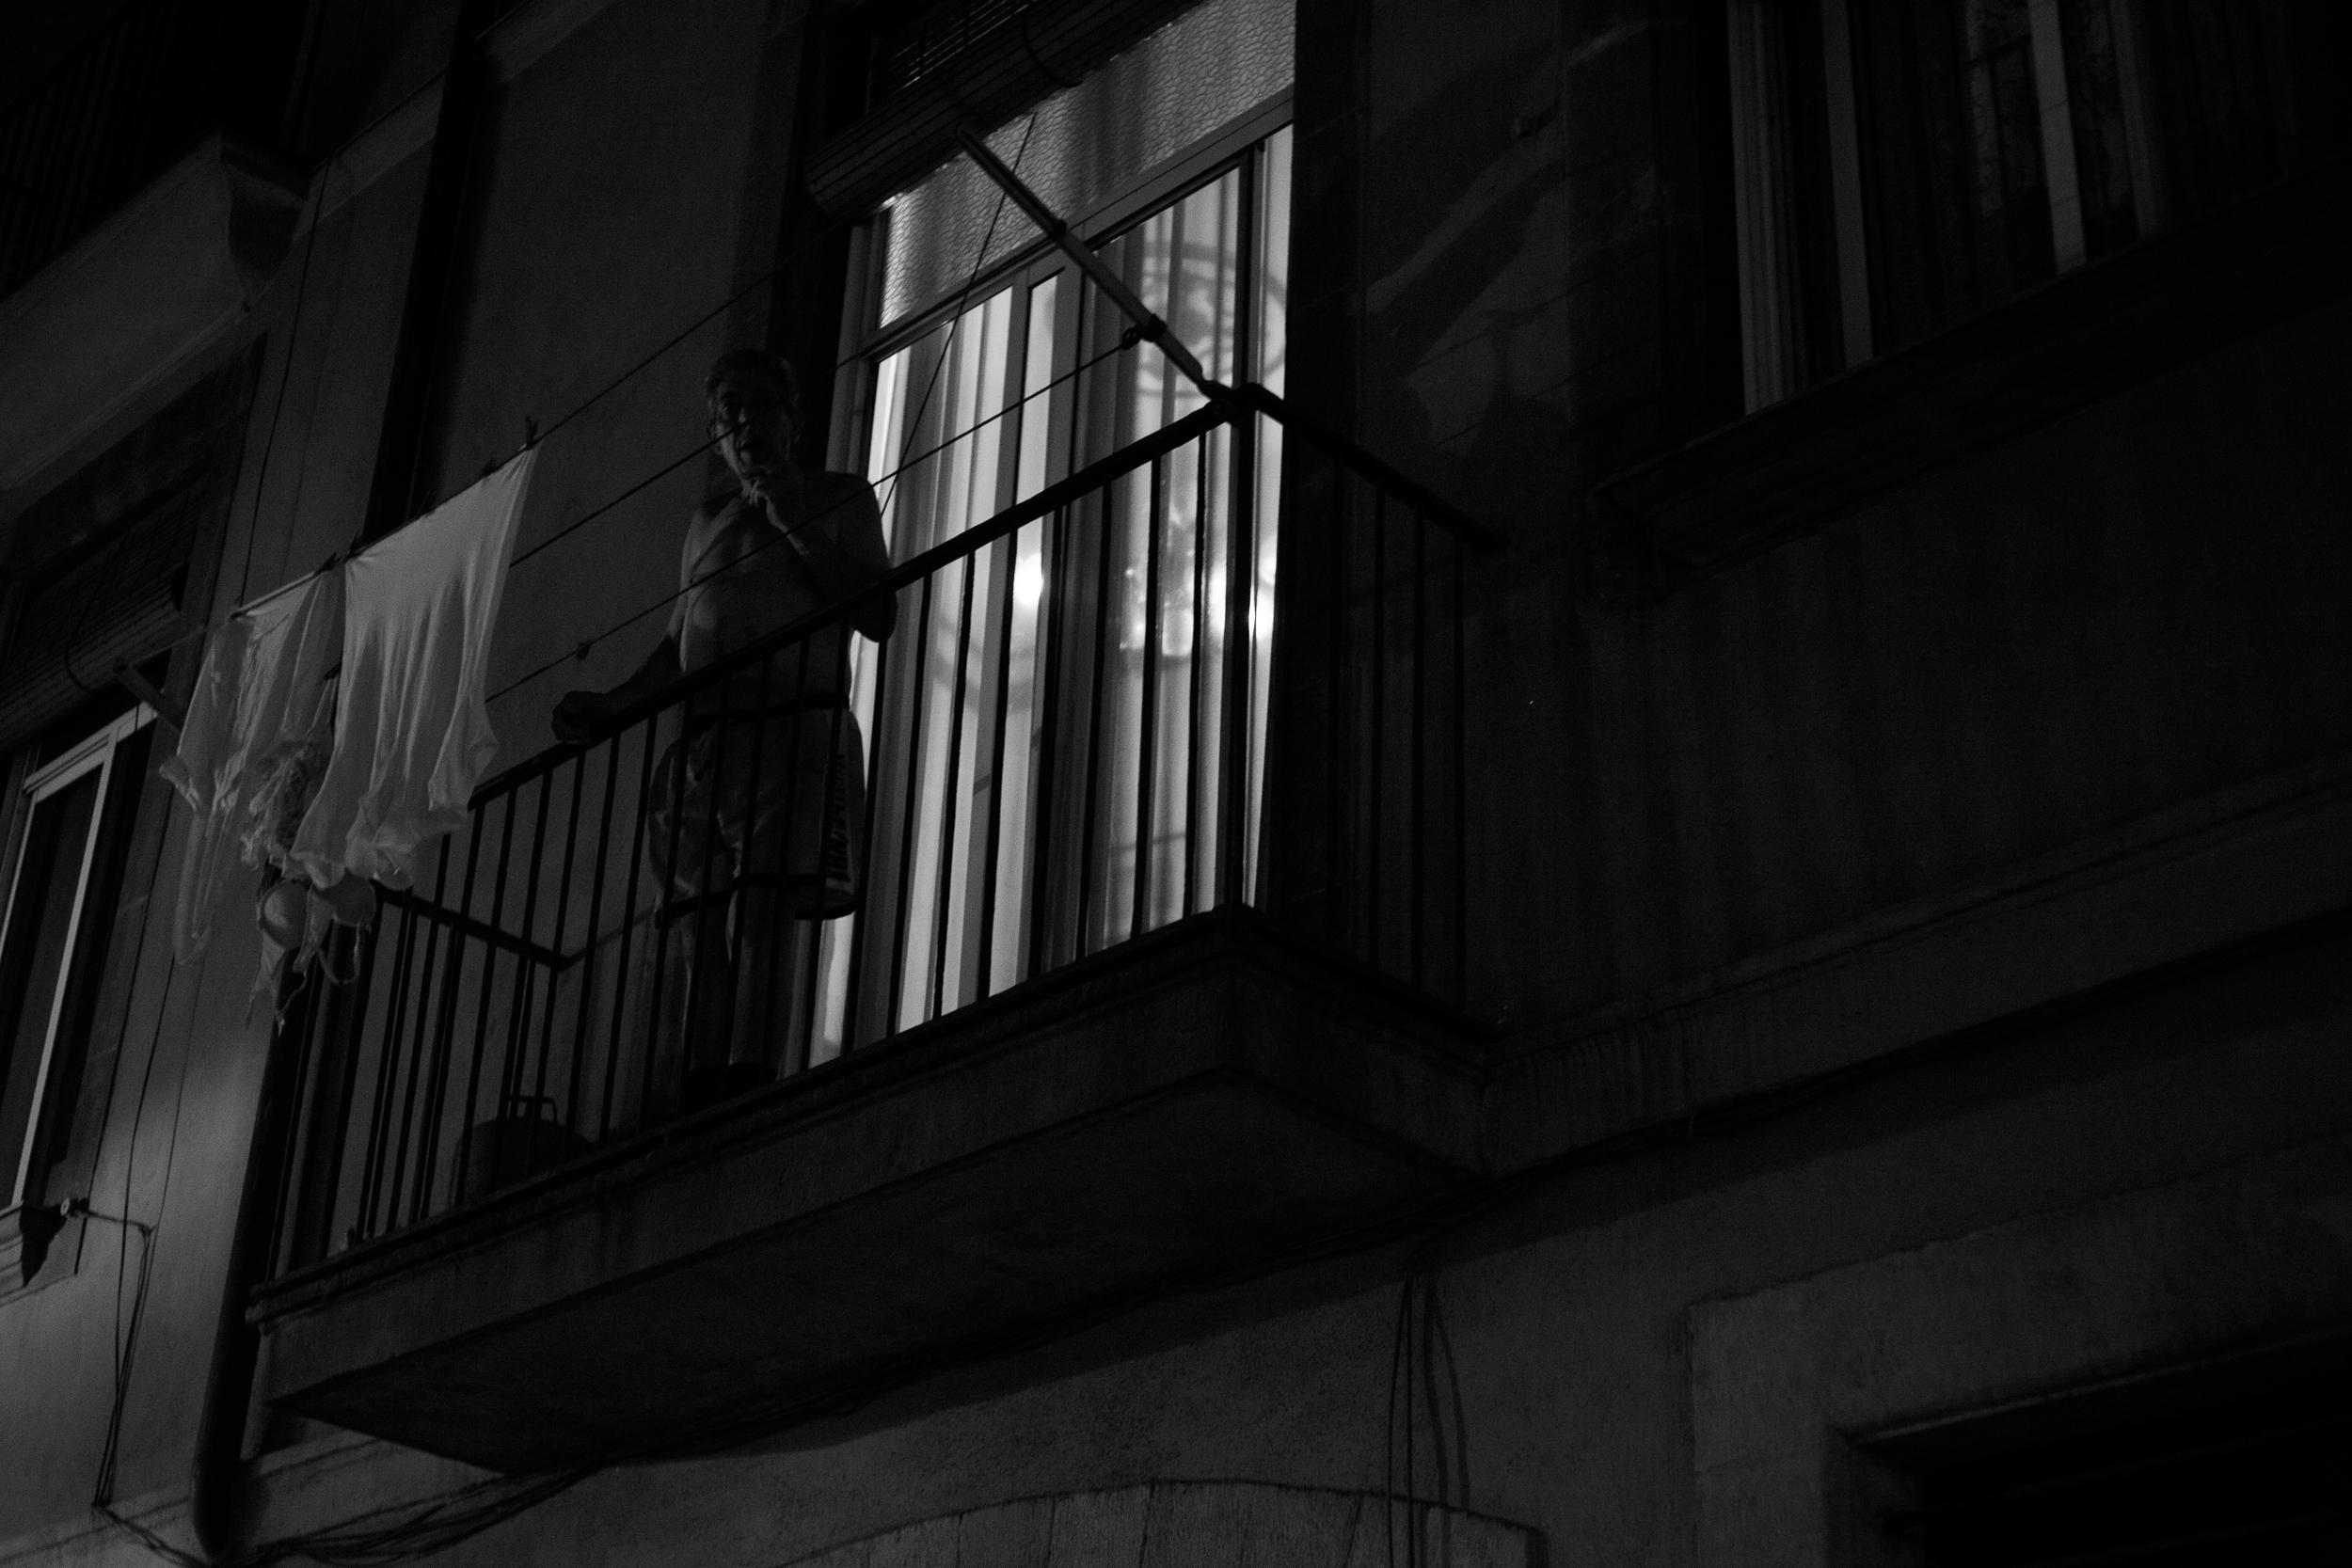 Chacon Images_Barcelona_Street_WEB_-9806.jpg